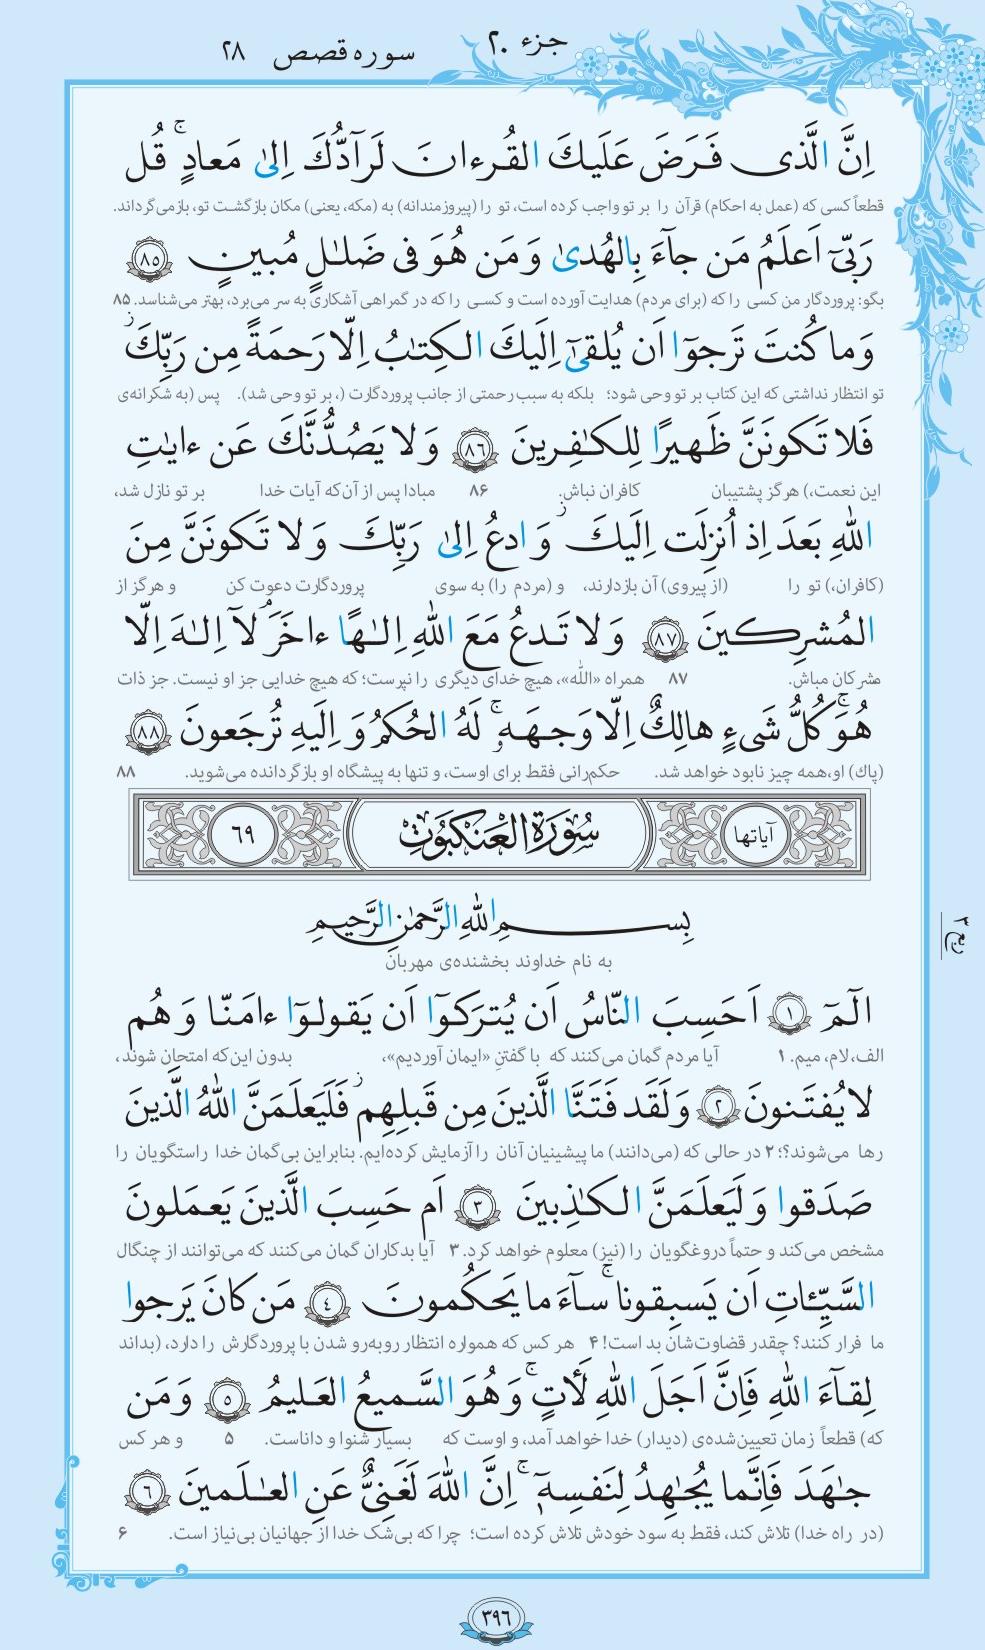 13990329000460 Test NewPhotoFree - ترتیل صفحه ۳۹۶  قرآن با صدای عبدالباسط+صوت و متن